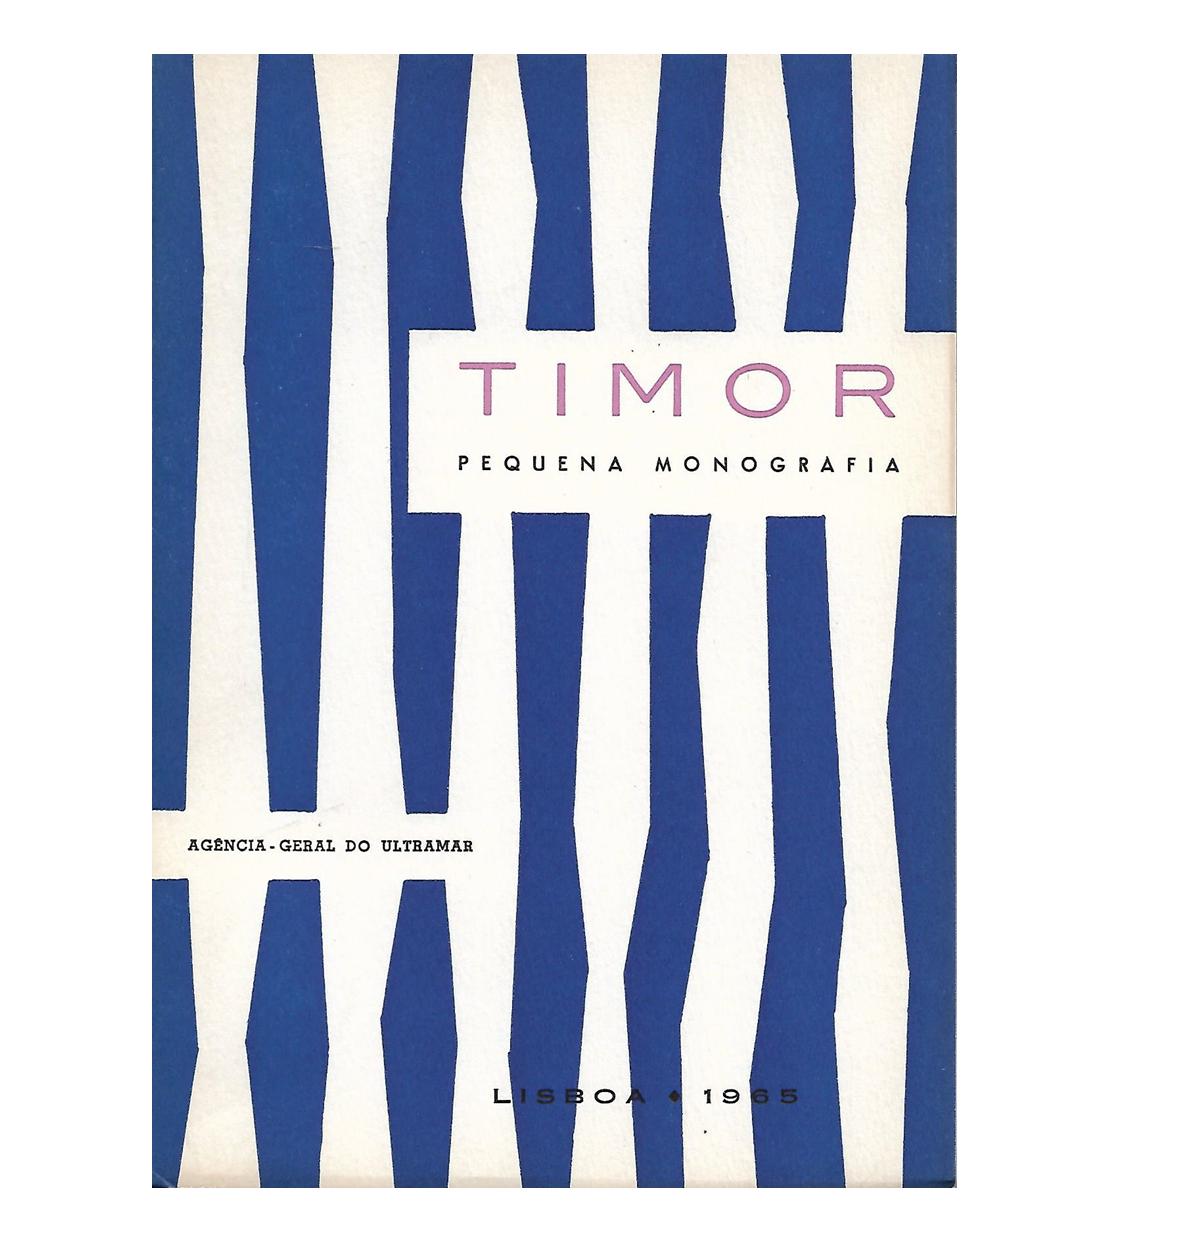 TIMOR. Pequena Monografia